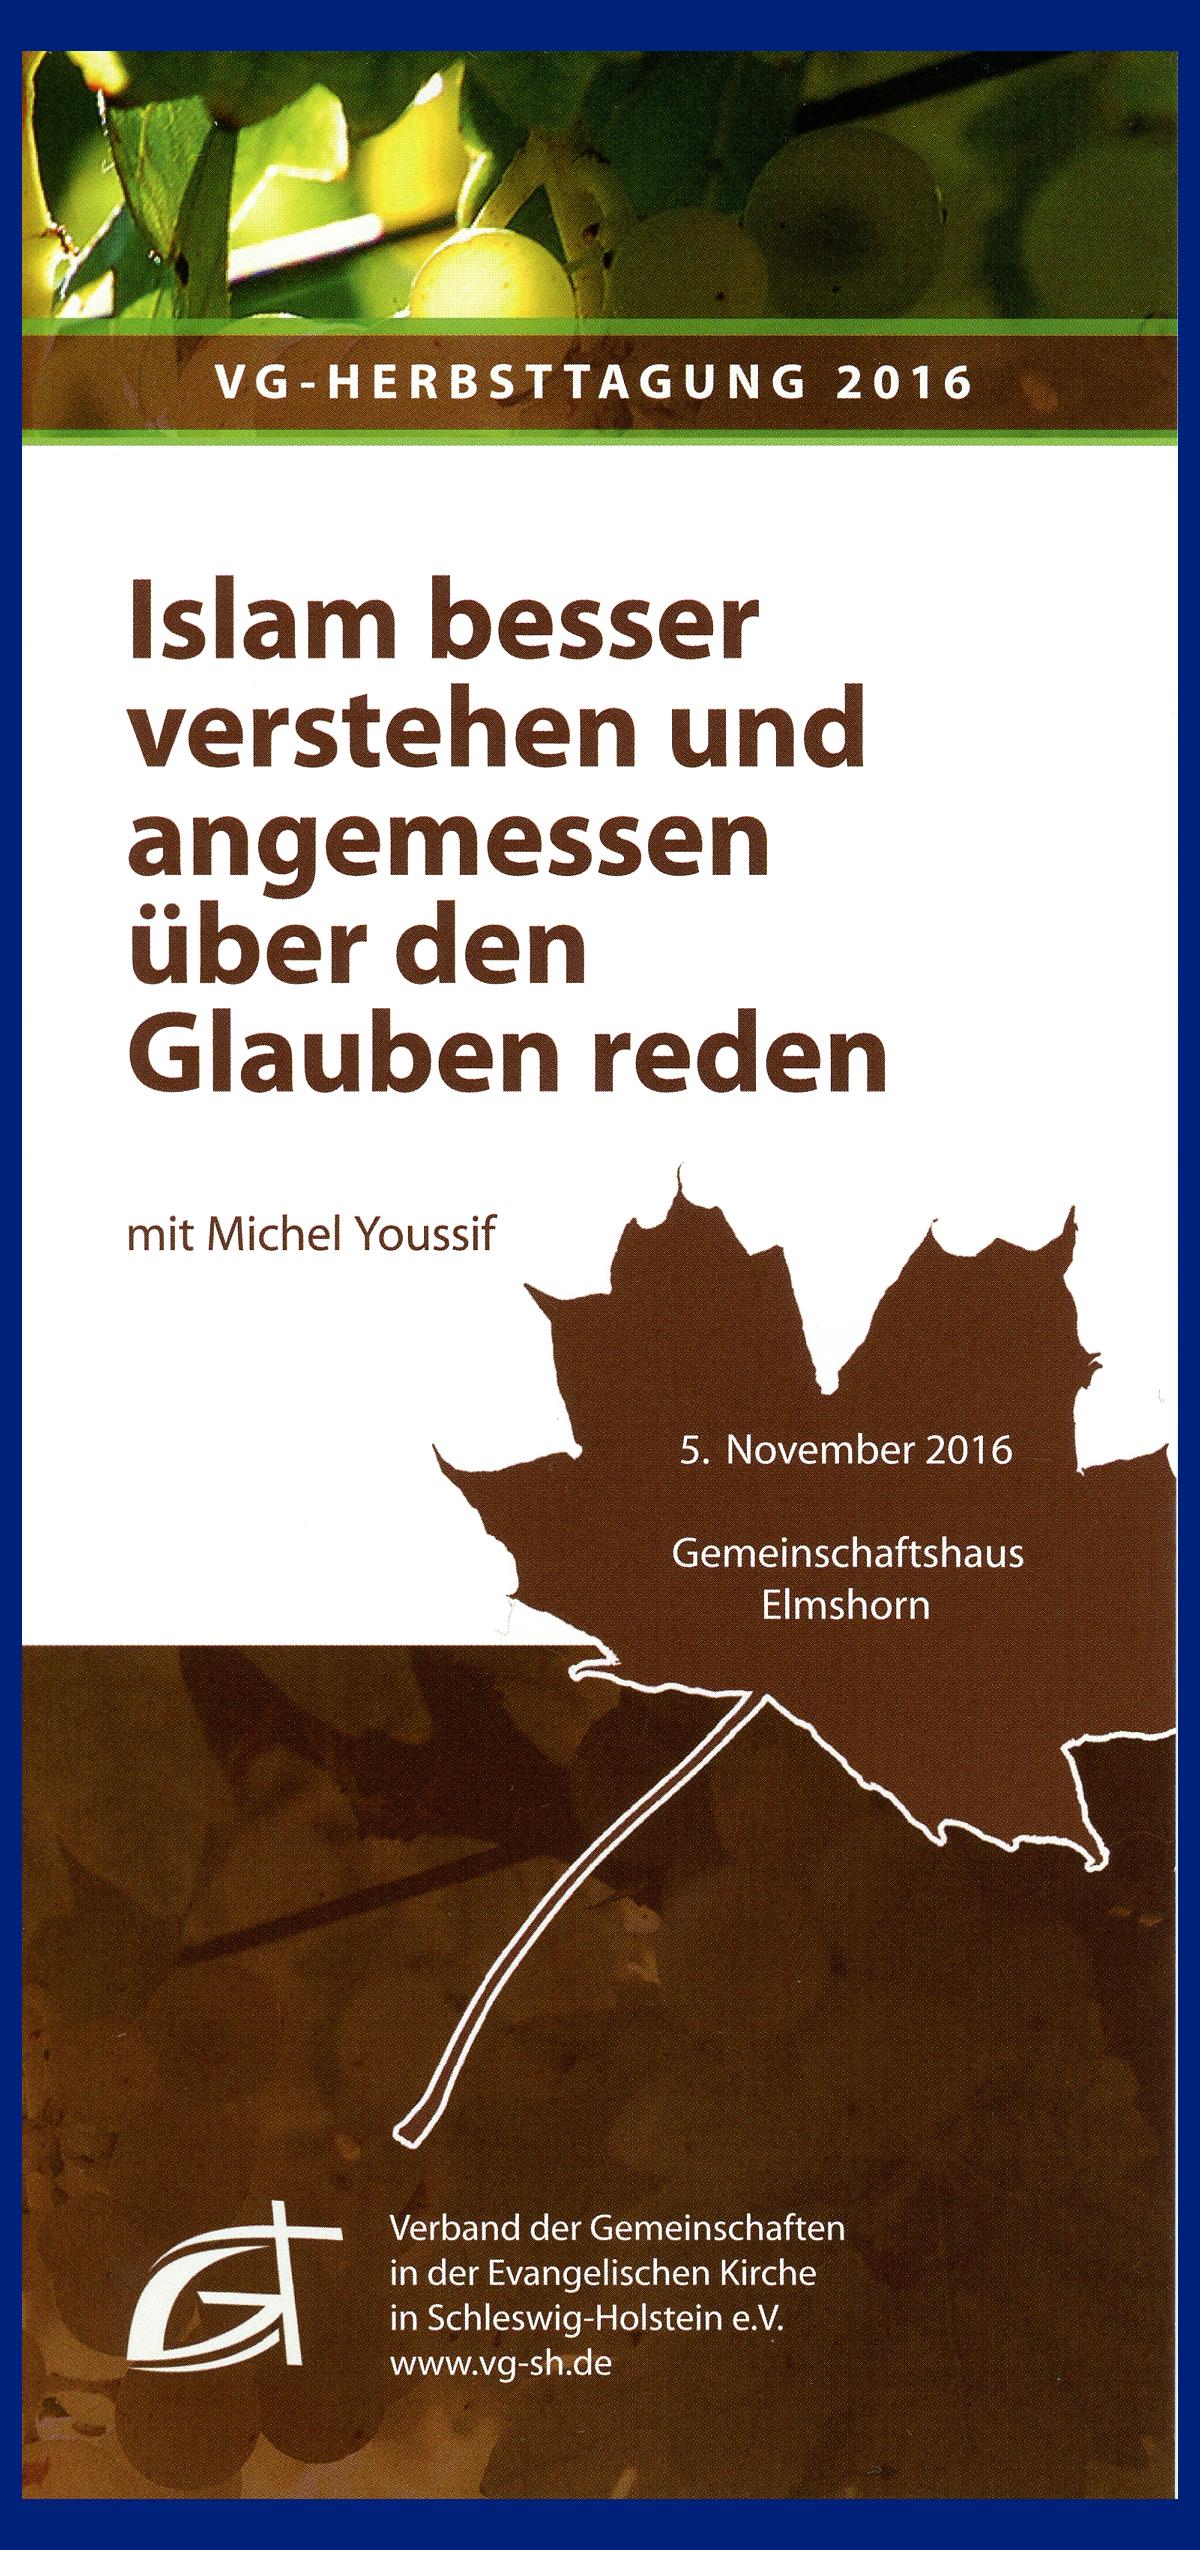 Michael Ottersbach, pixelio